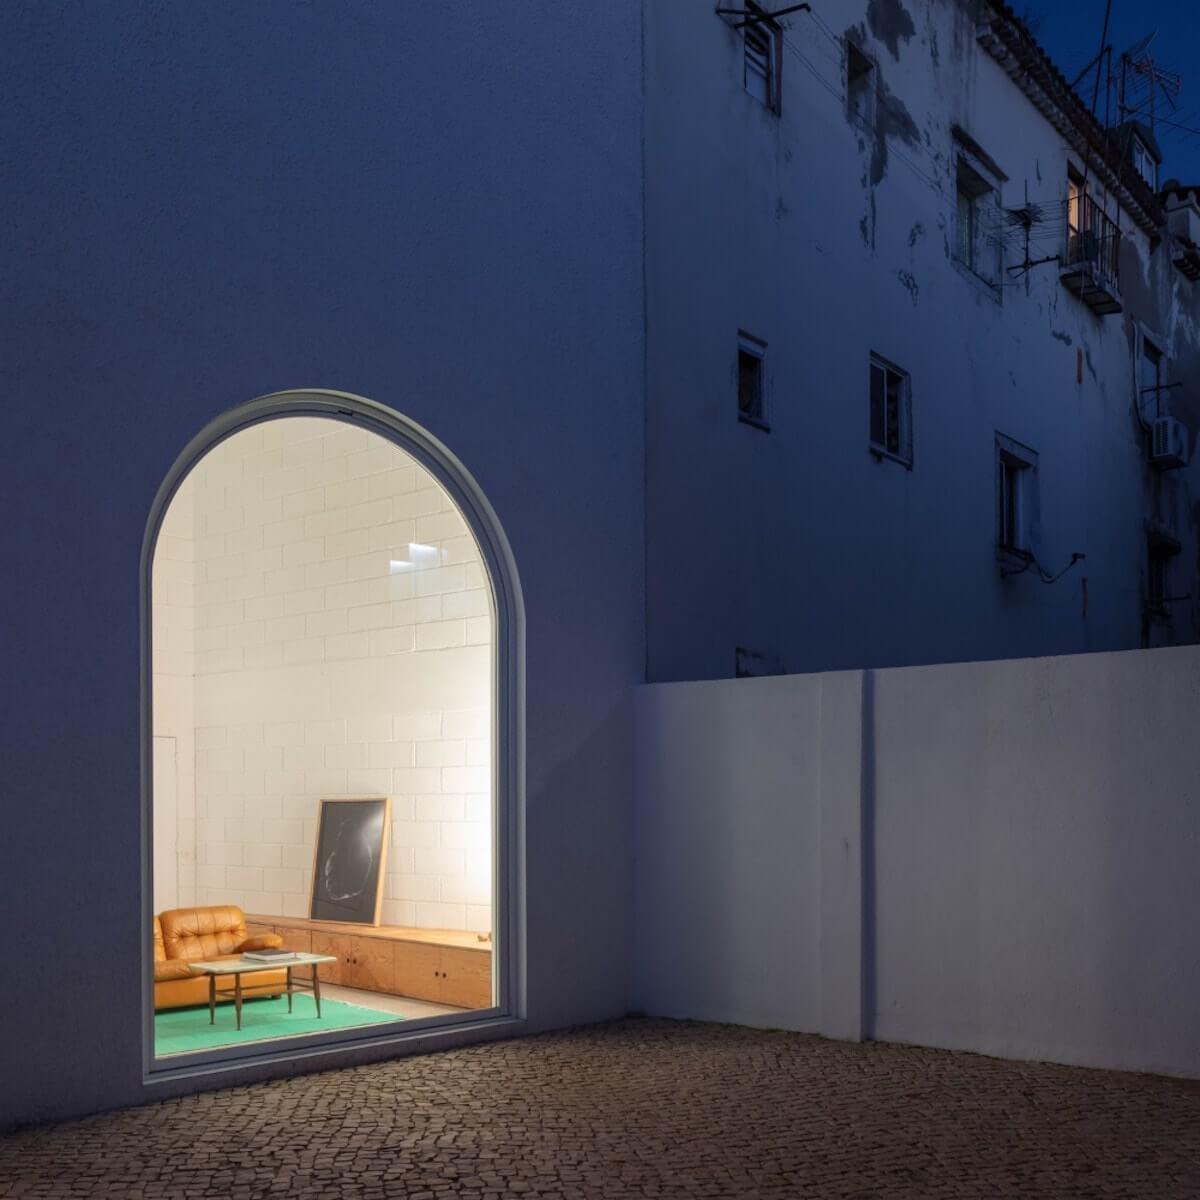 Arquitetura: Daniel Zamarbide .  Projeto: Dodged House .  Fotografia: ©Dylan Perrenoud